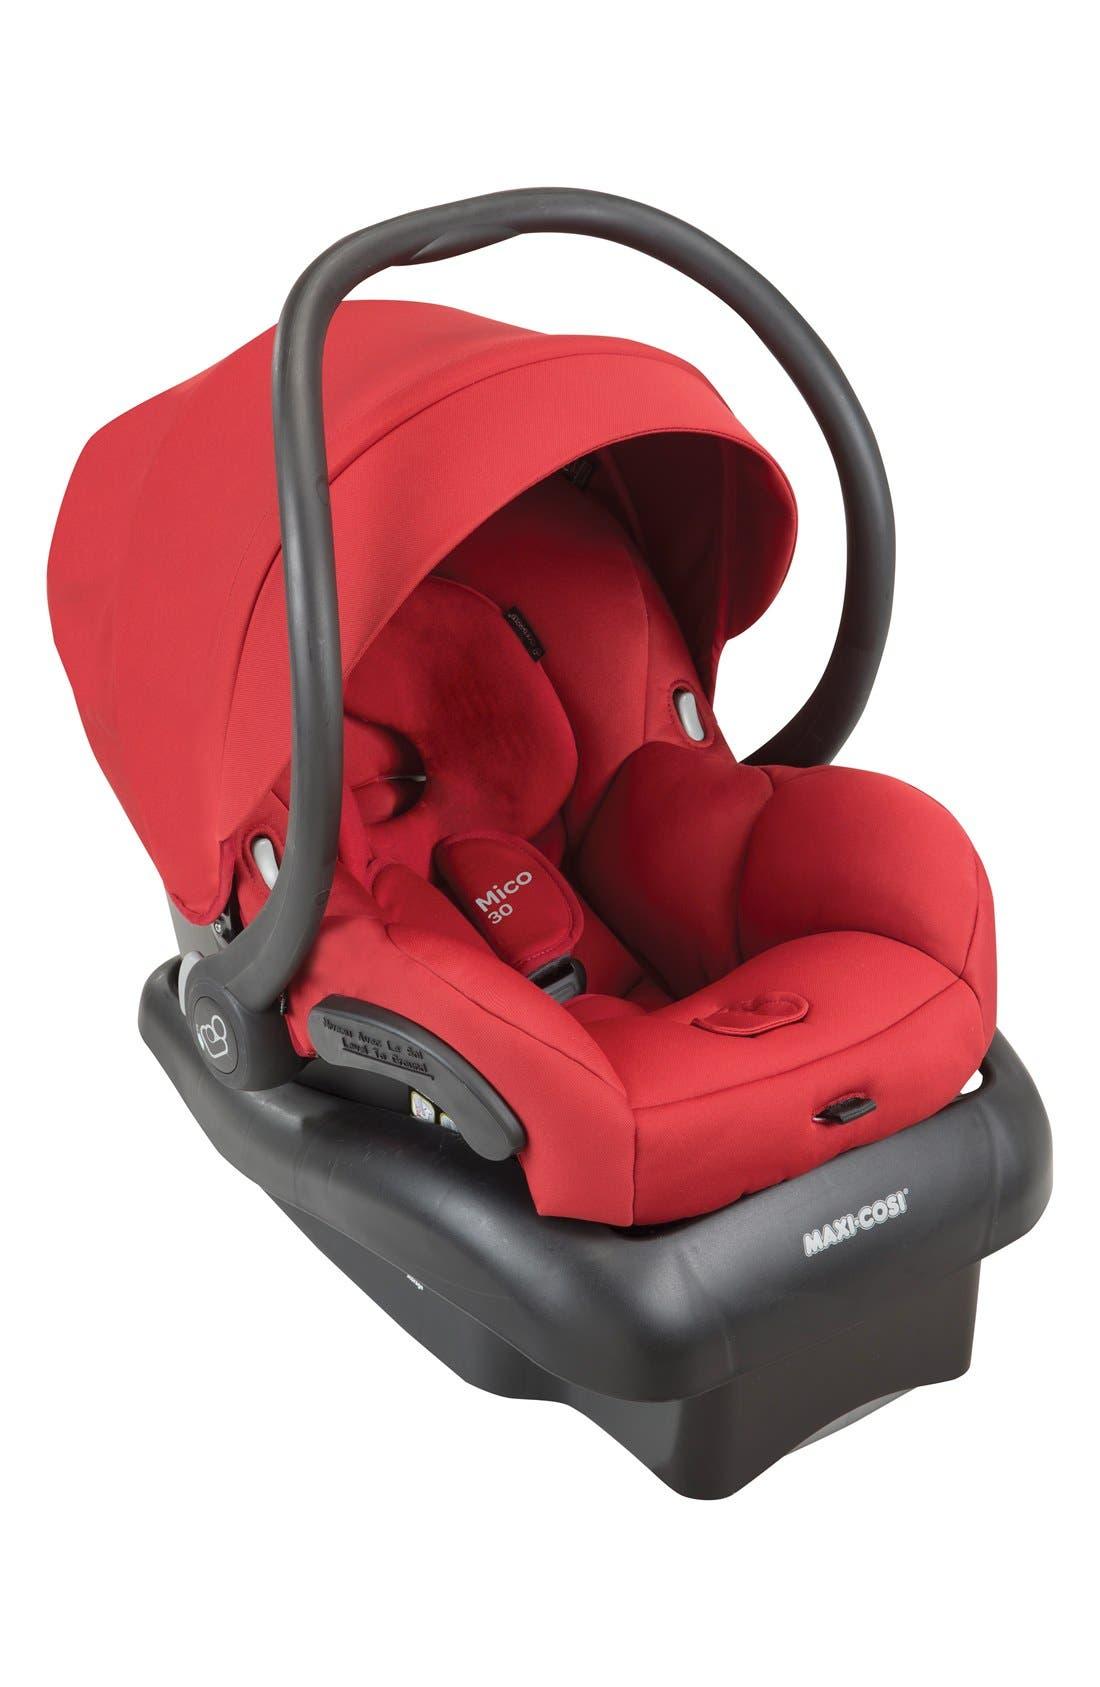 Maxi-Cosi® 'Mico 30' Infant Car Seat